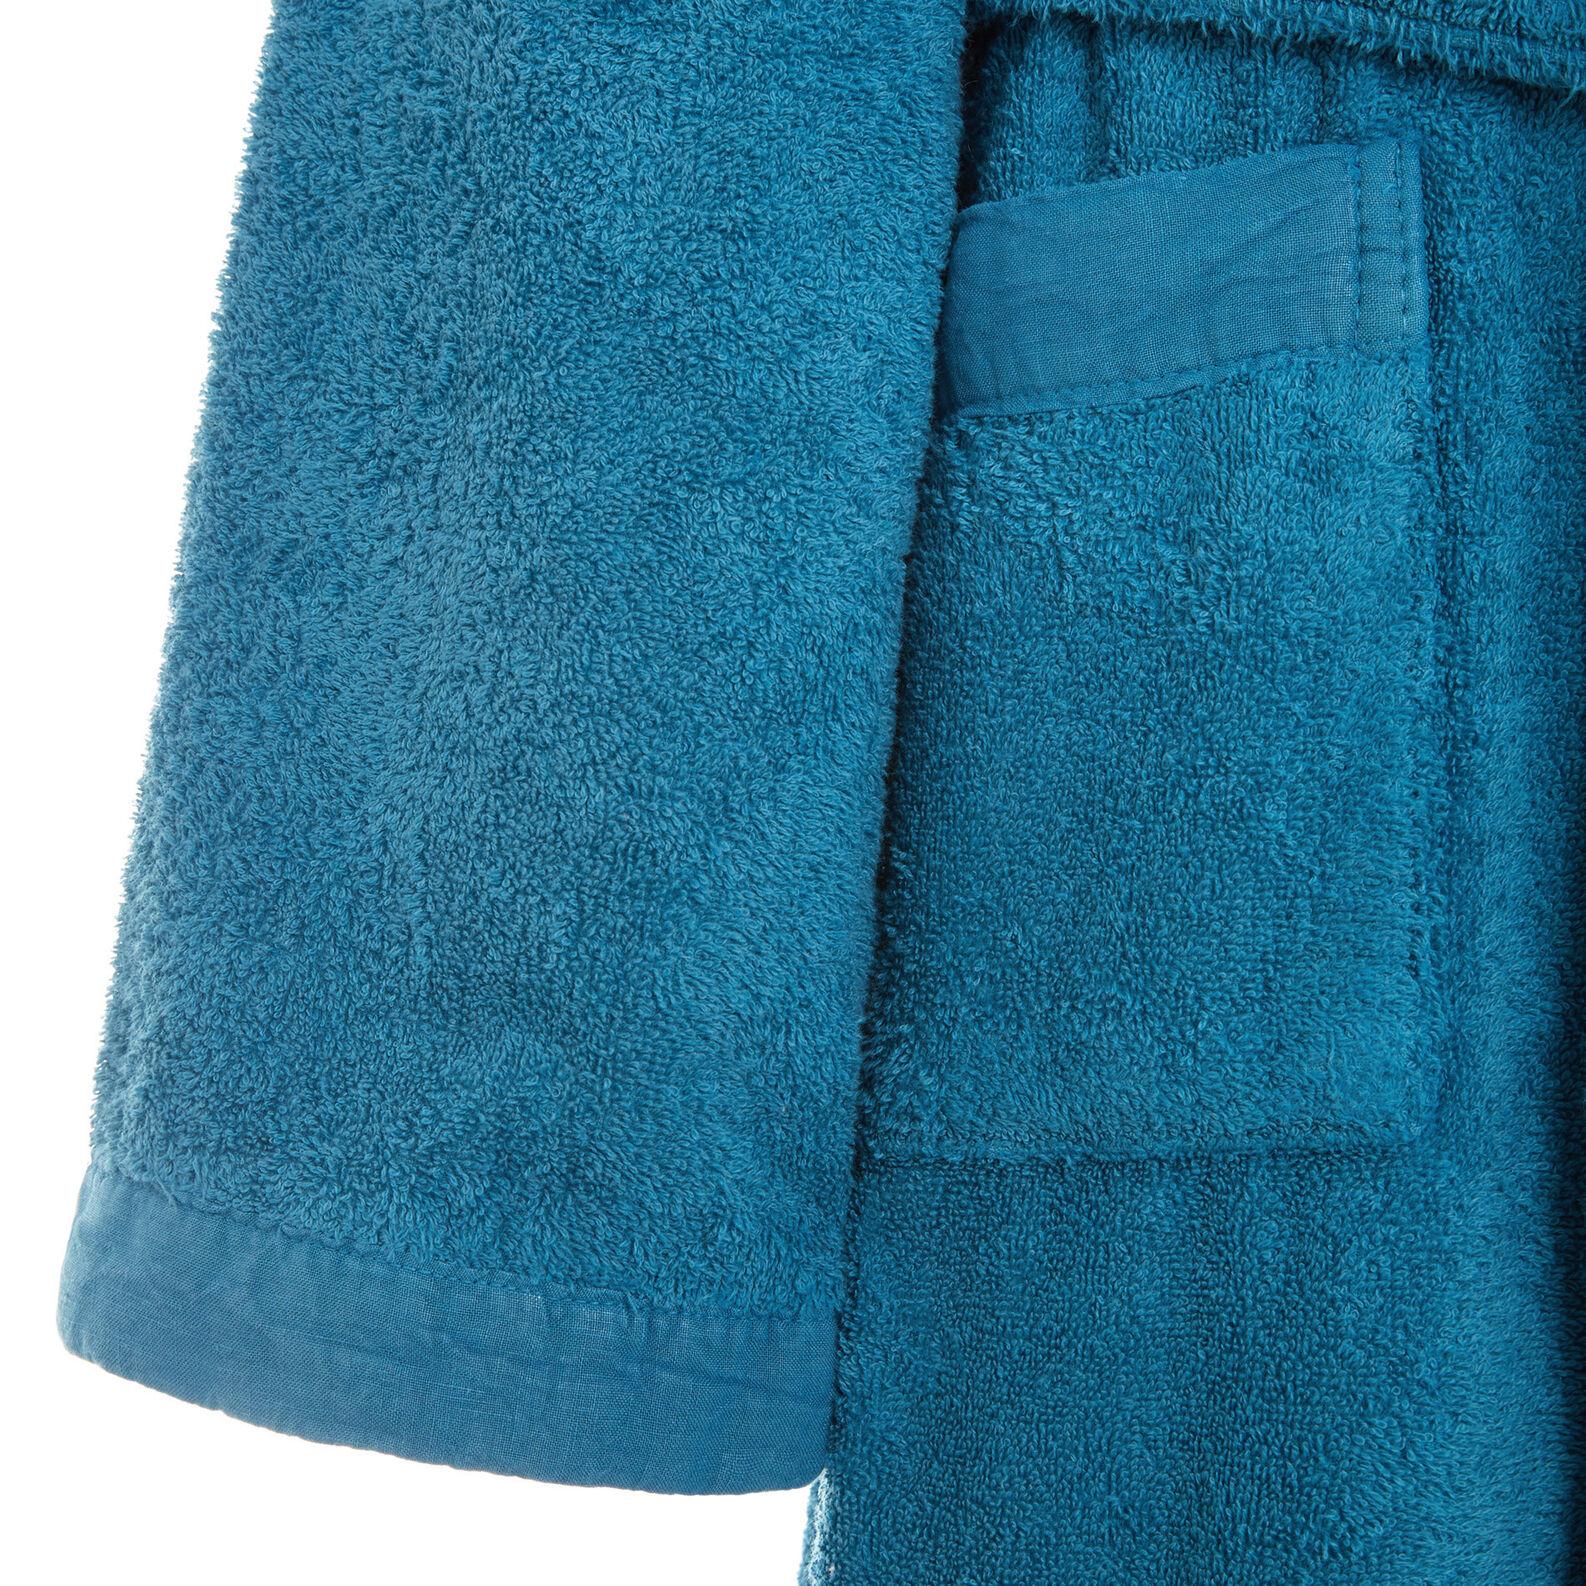 Bathrobe in 100% organic cotton with linen trim